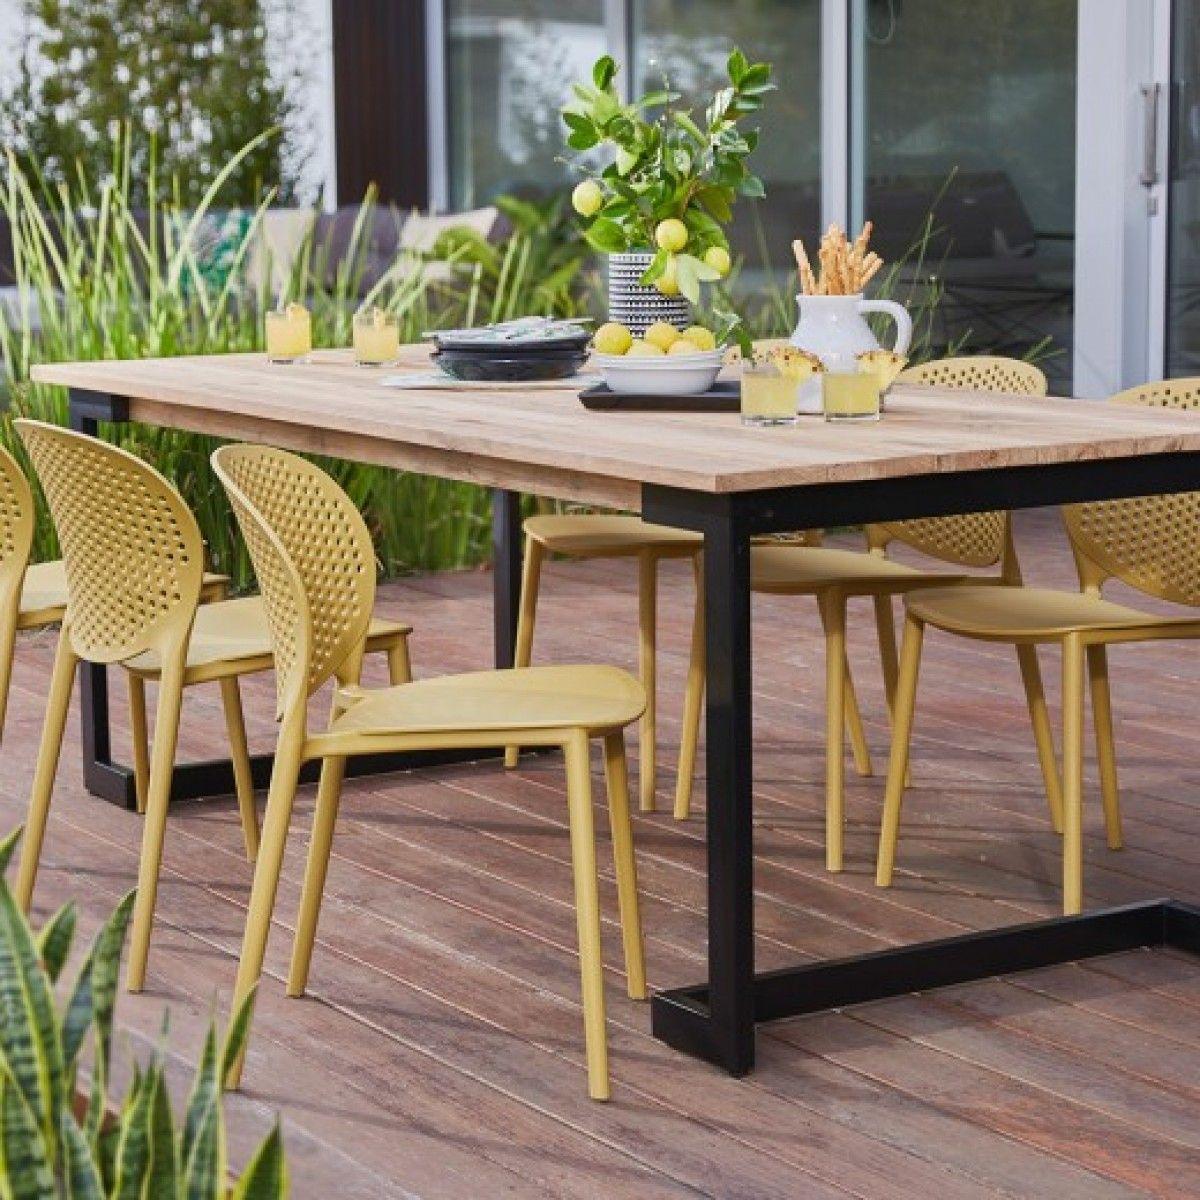 Axel reclaimed teak table 2200 x 1000 tables outdoor